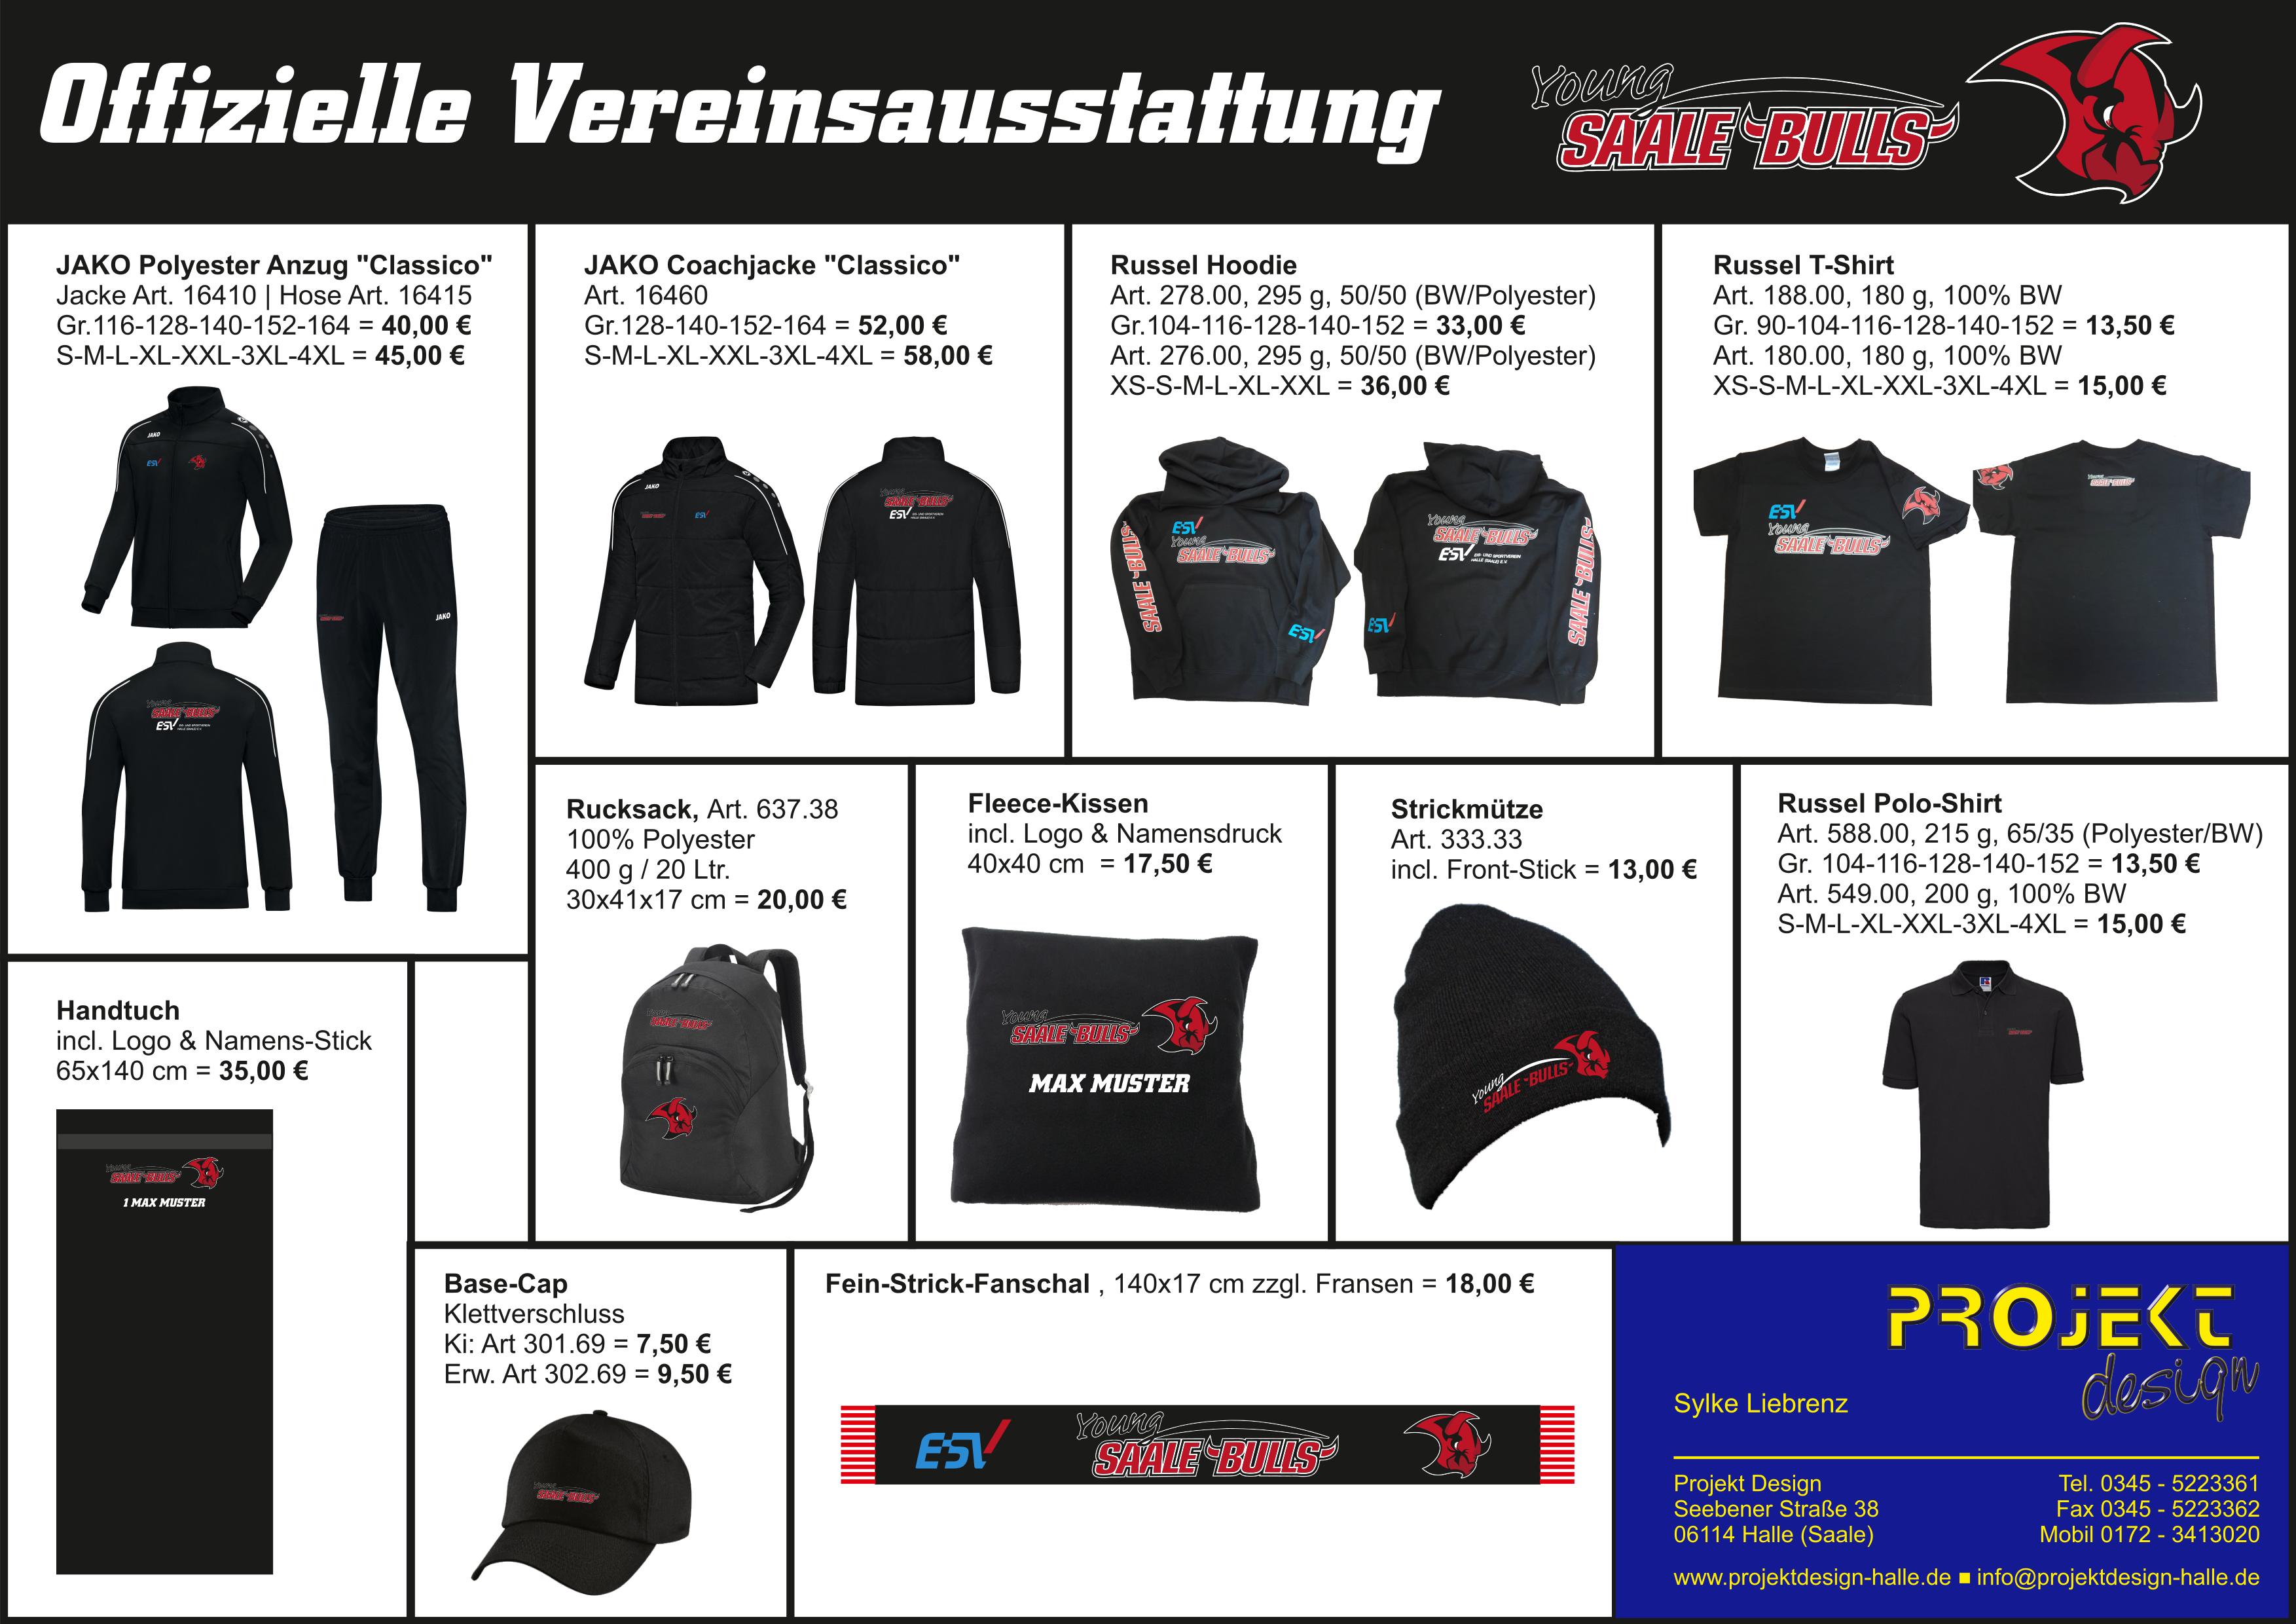 Young Saale Bulls Teamwear via Projekt Design